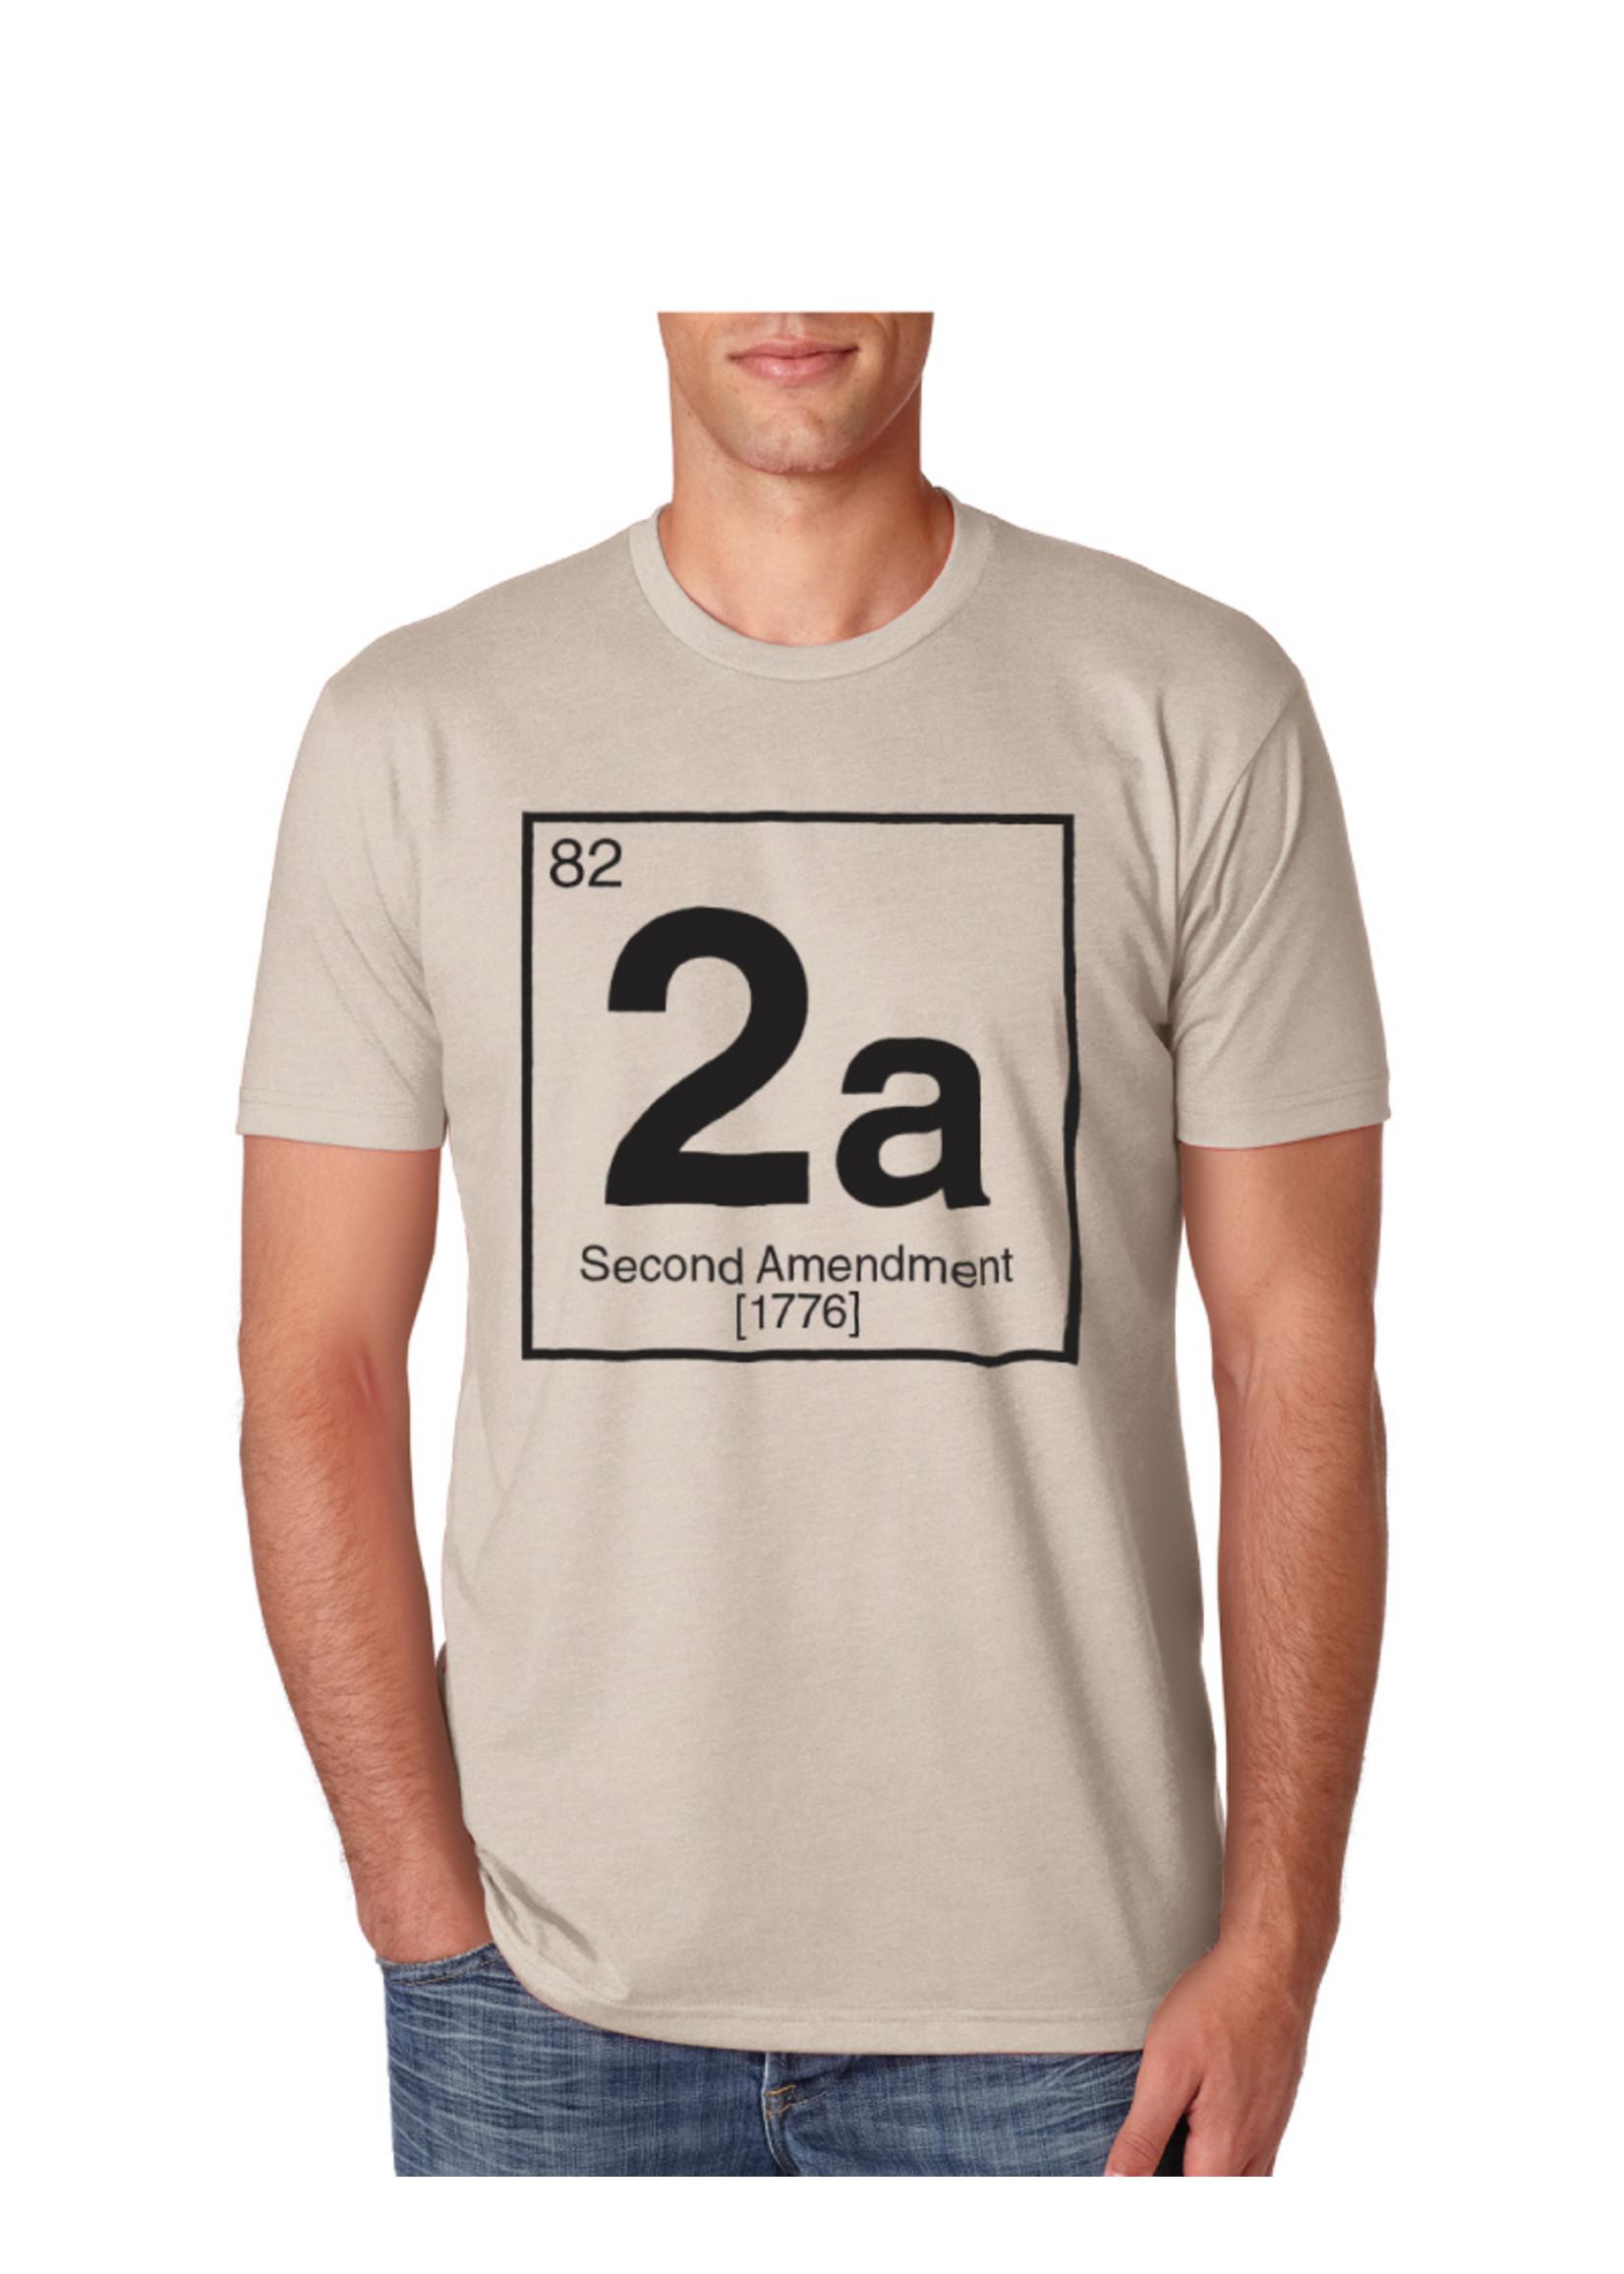 Defender Outdoors 2nd Amendment T-Shirt